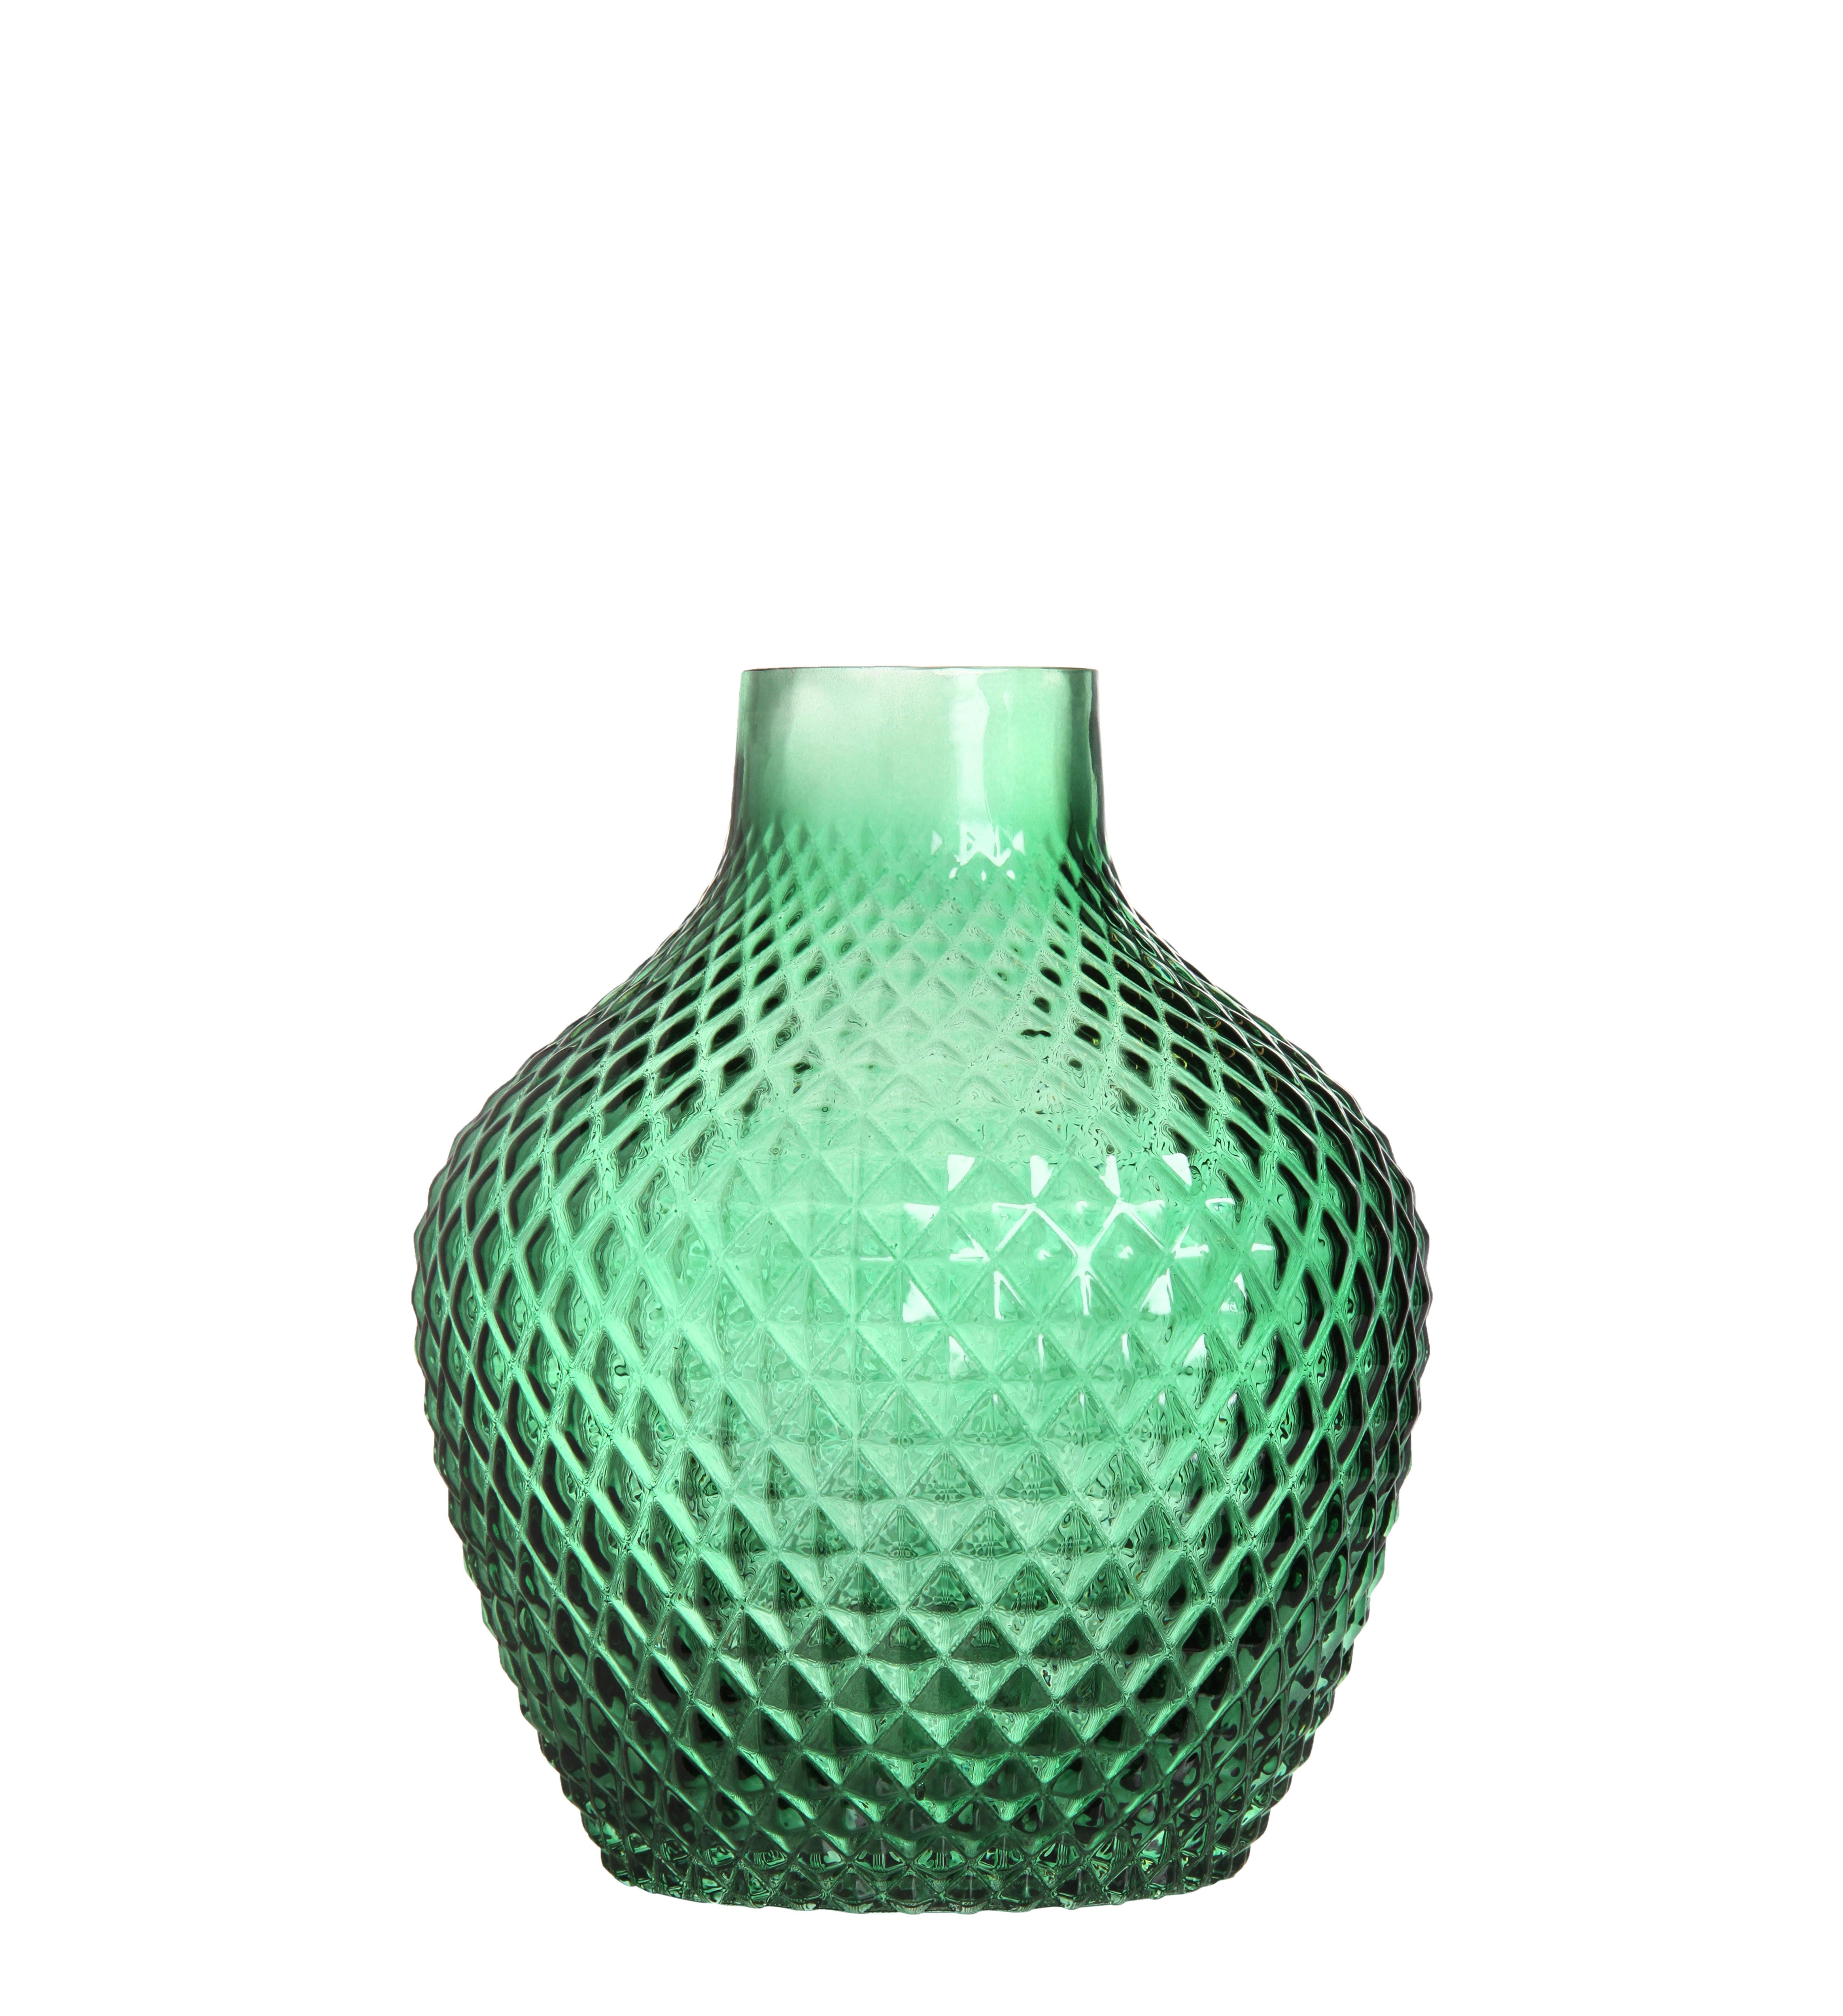 Decoration - Vases - 70 Round Vase - / Ø 17 x H 20 cm by & klevering - Green - Glass